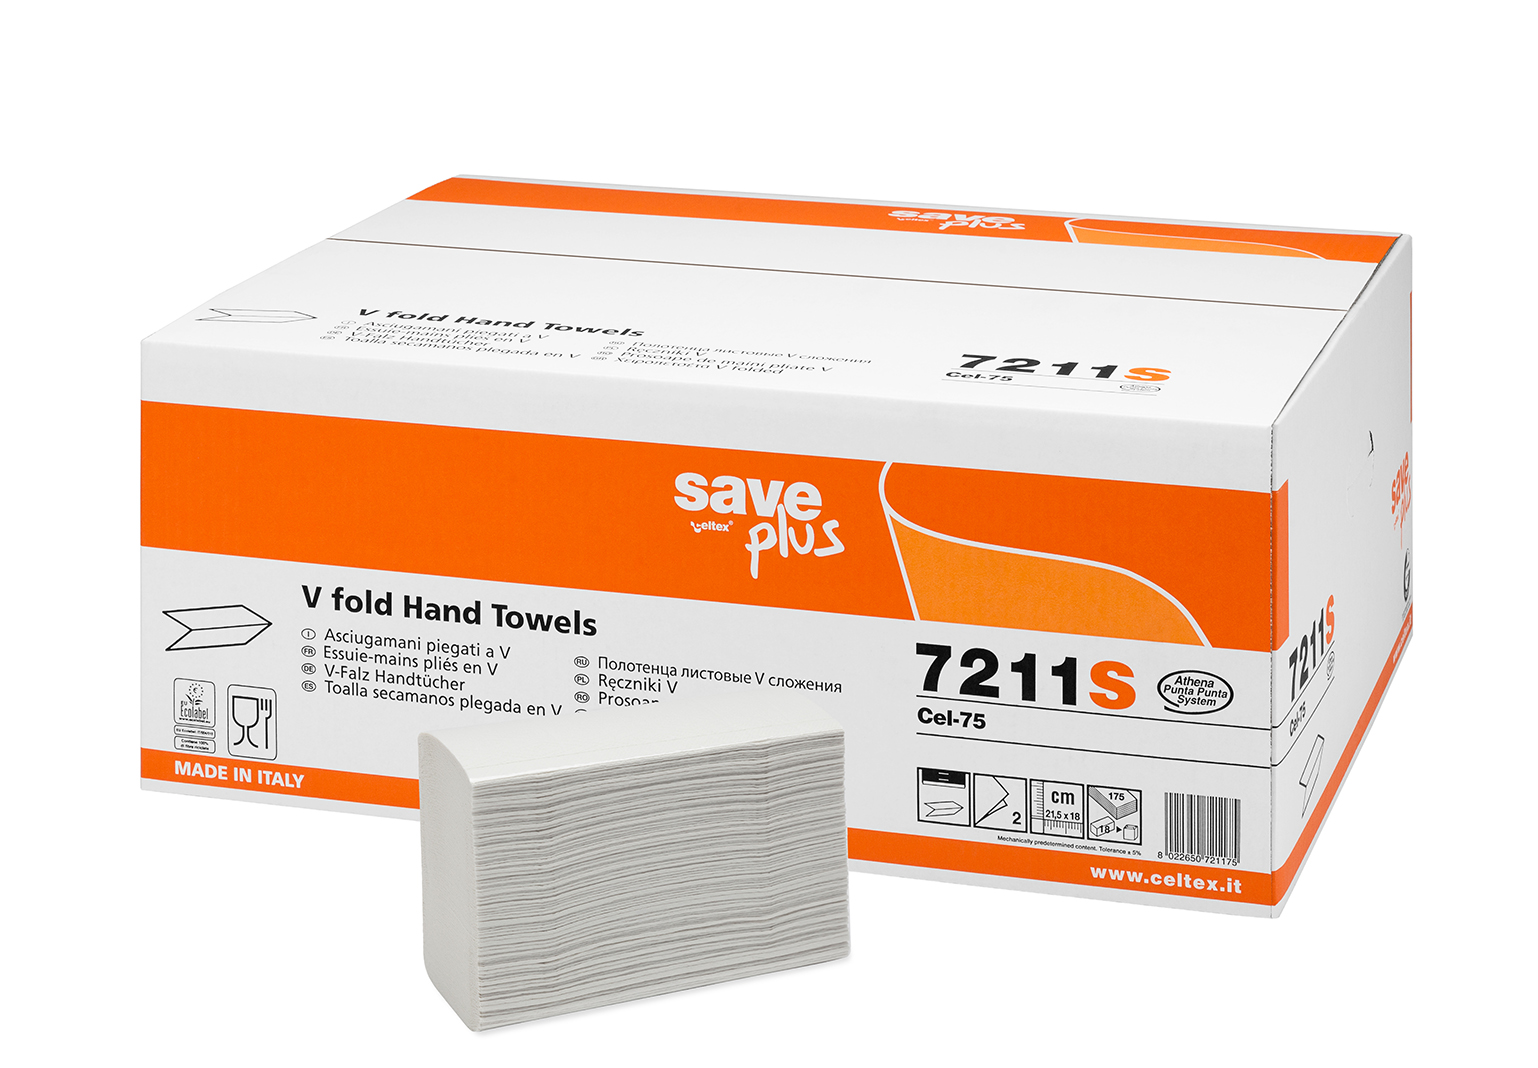 ASCIUGAMANI PIEGATO V SAVE CM 21,5x18 3150PZ